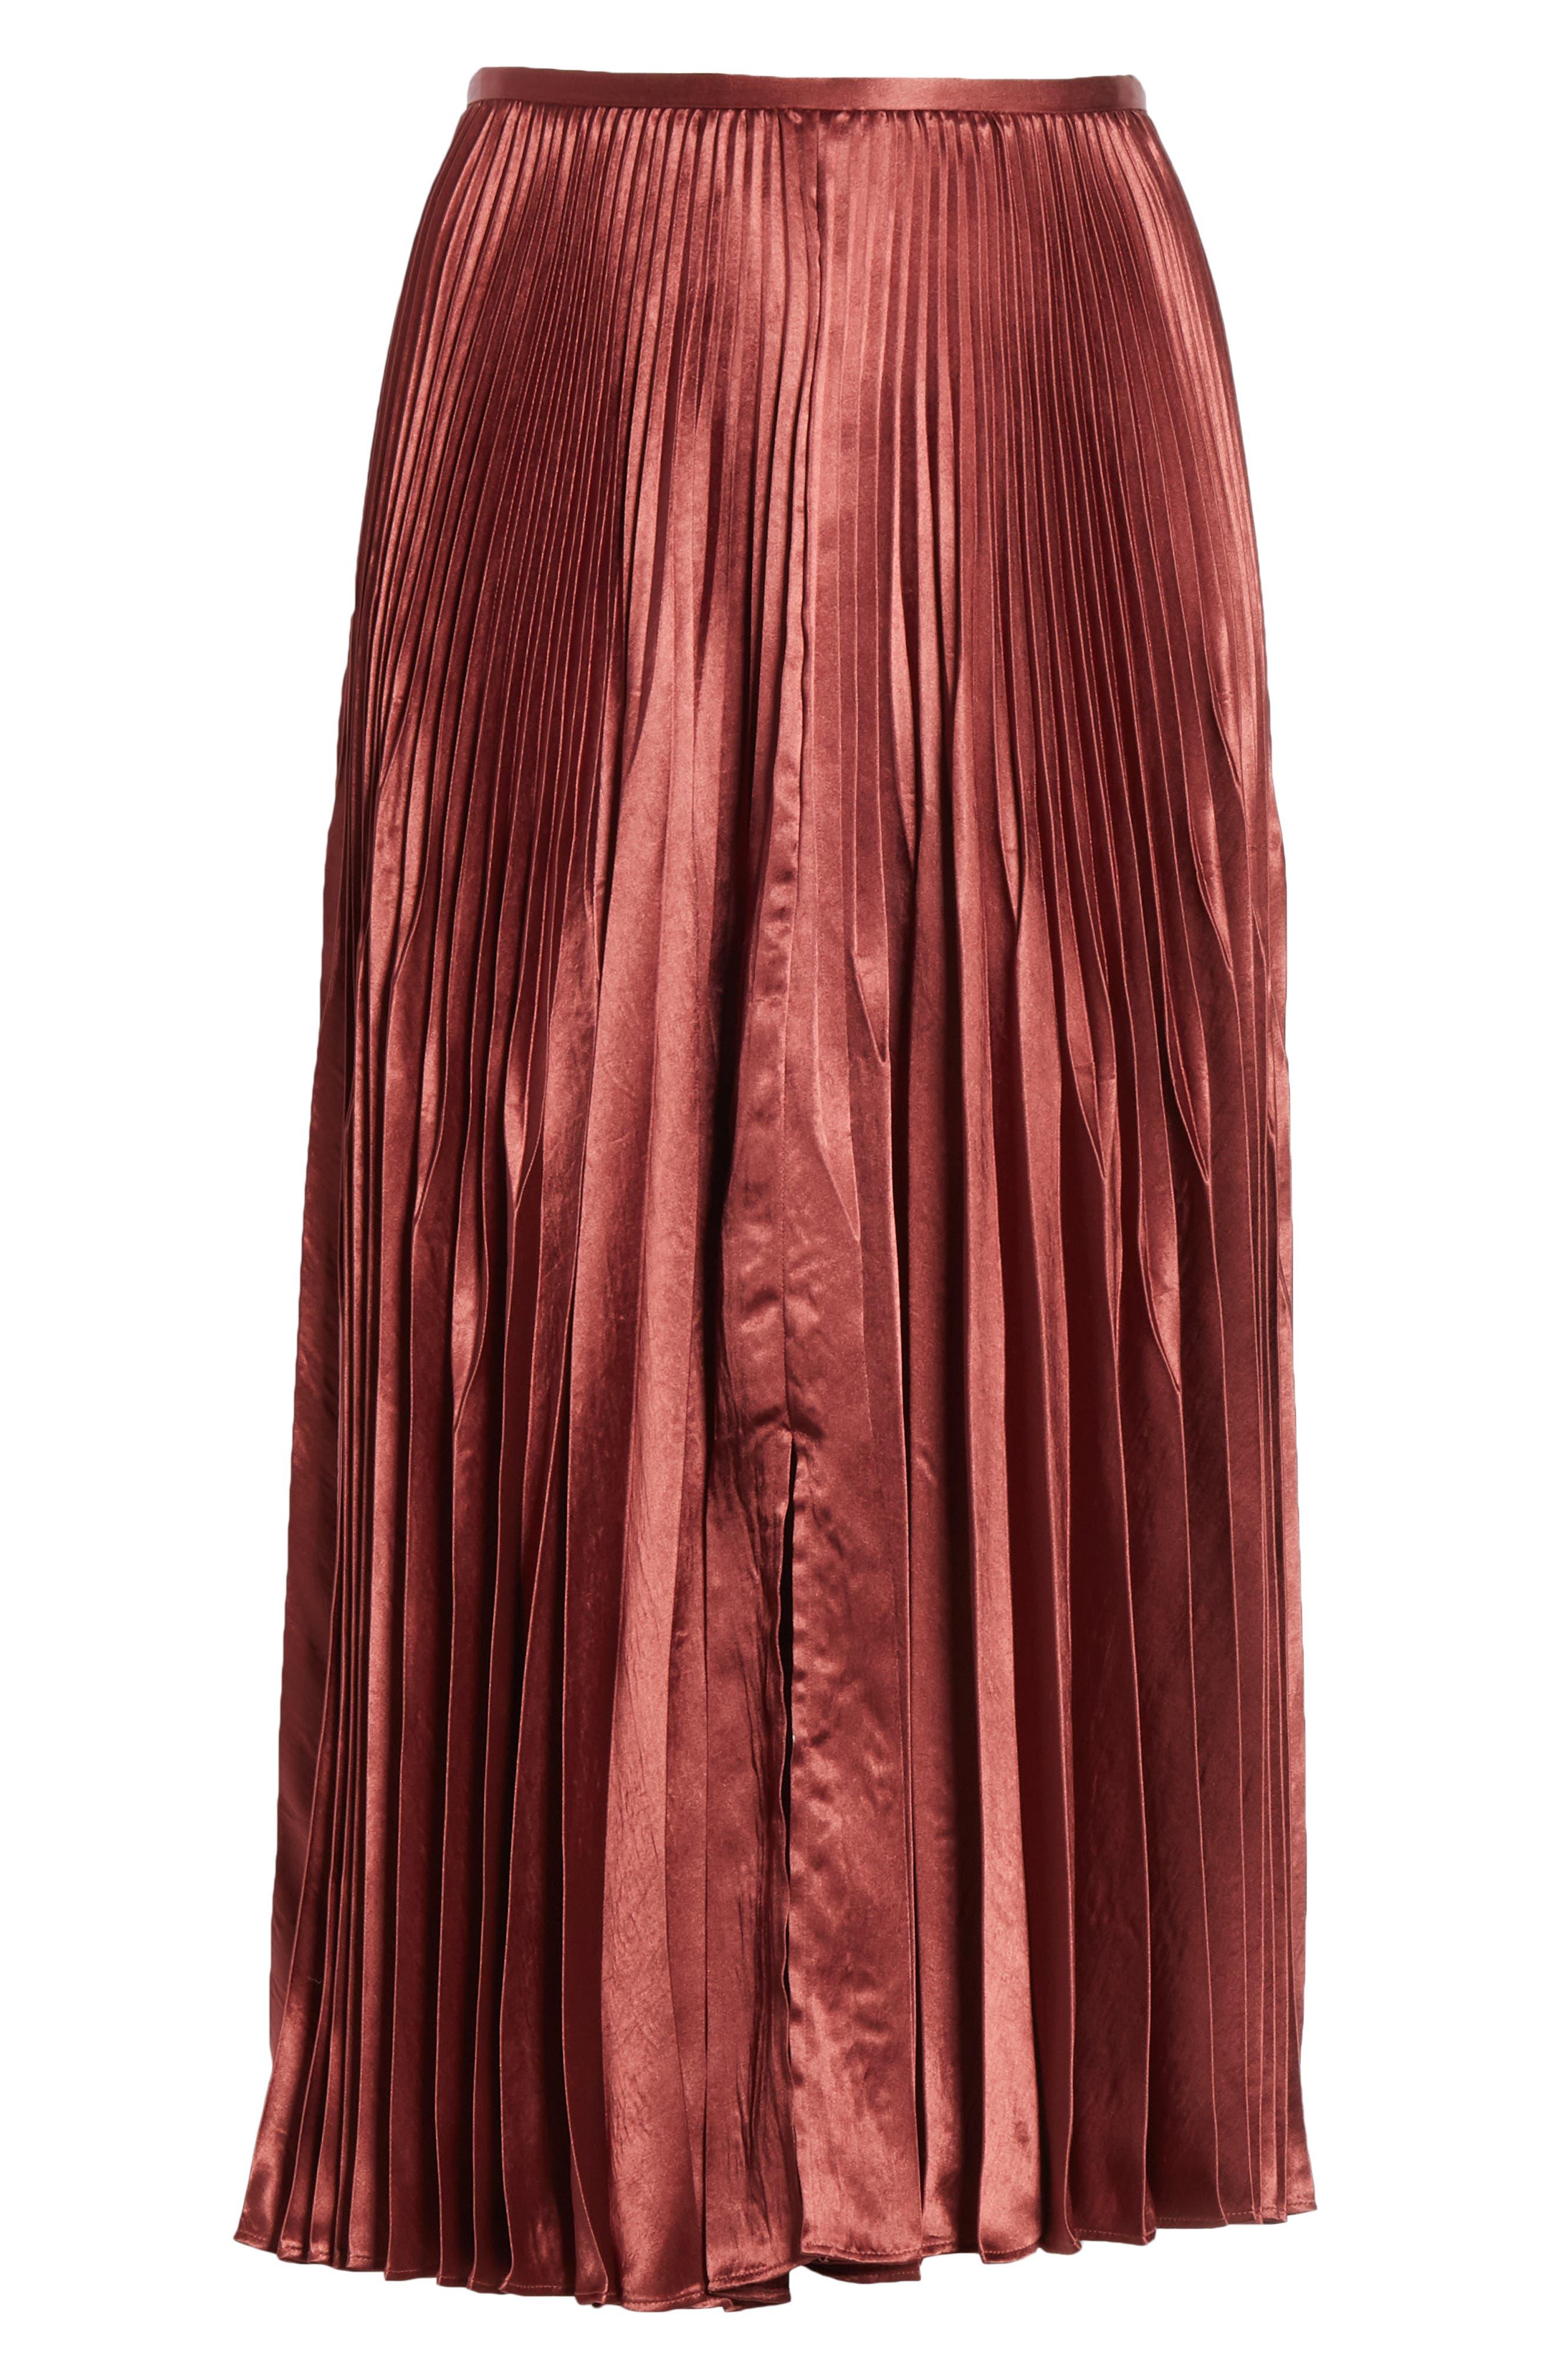 Chevron Pleated Satin Skirt,                             Alternate thumbnail 6, color,                             ANISE